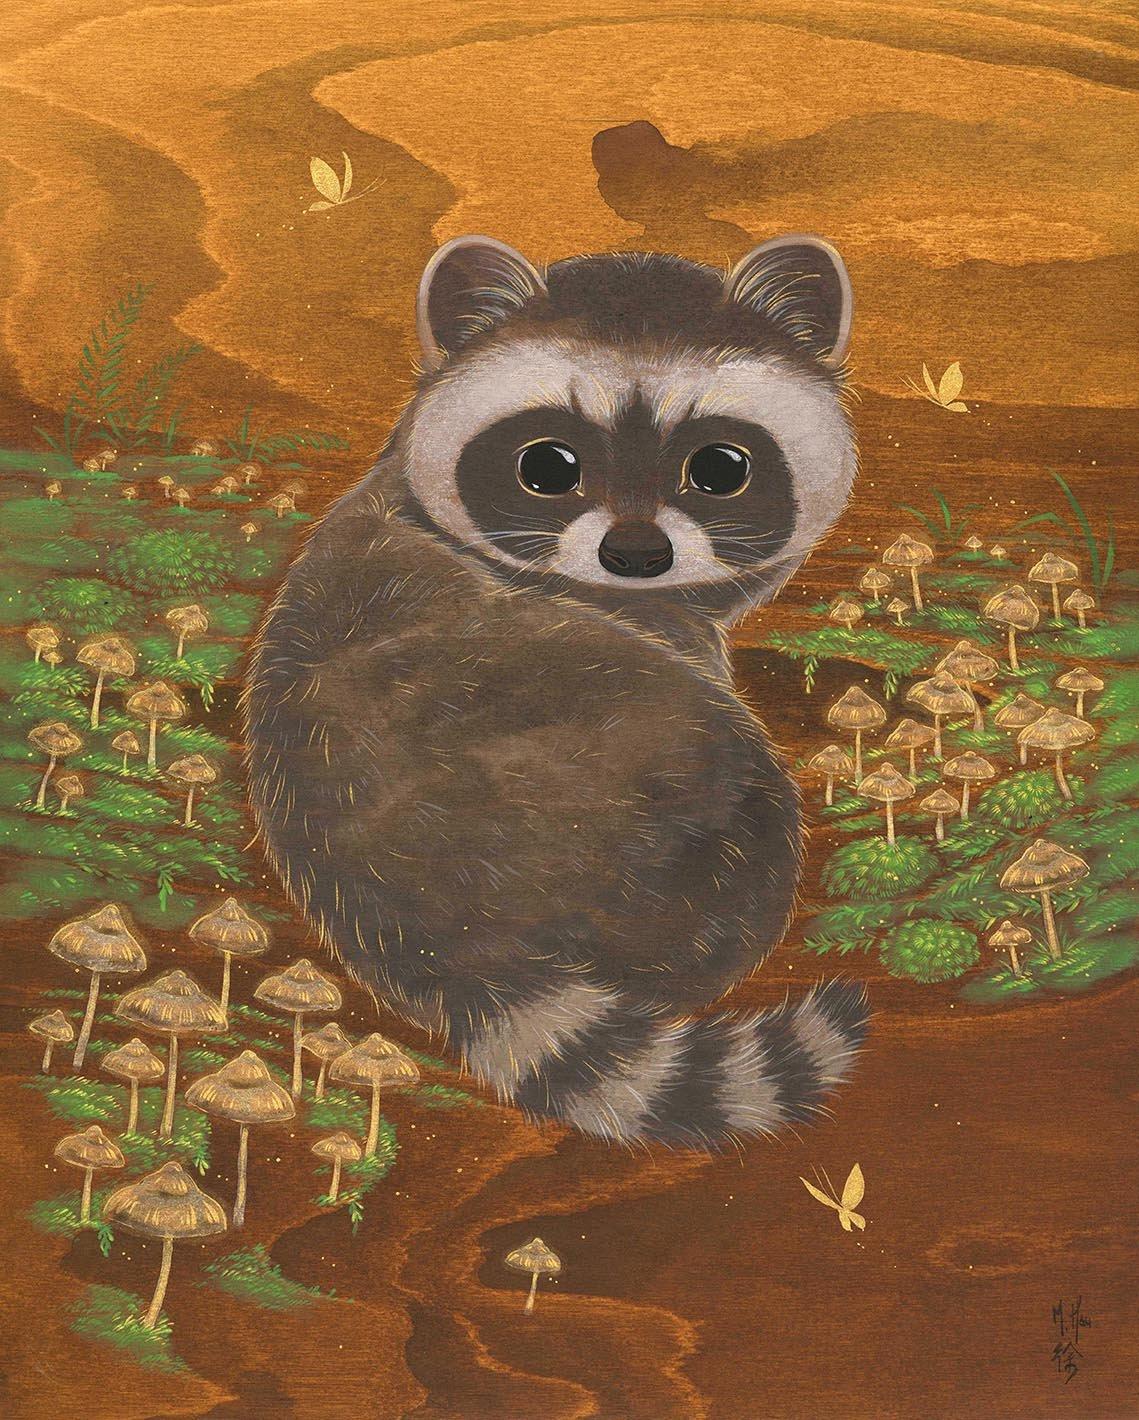 Raccoon and Wild Mushrooms